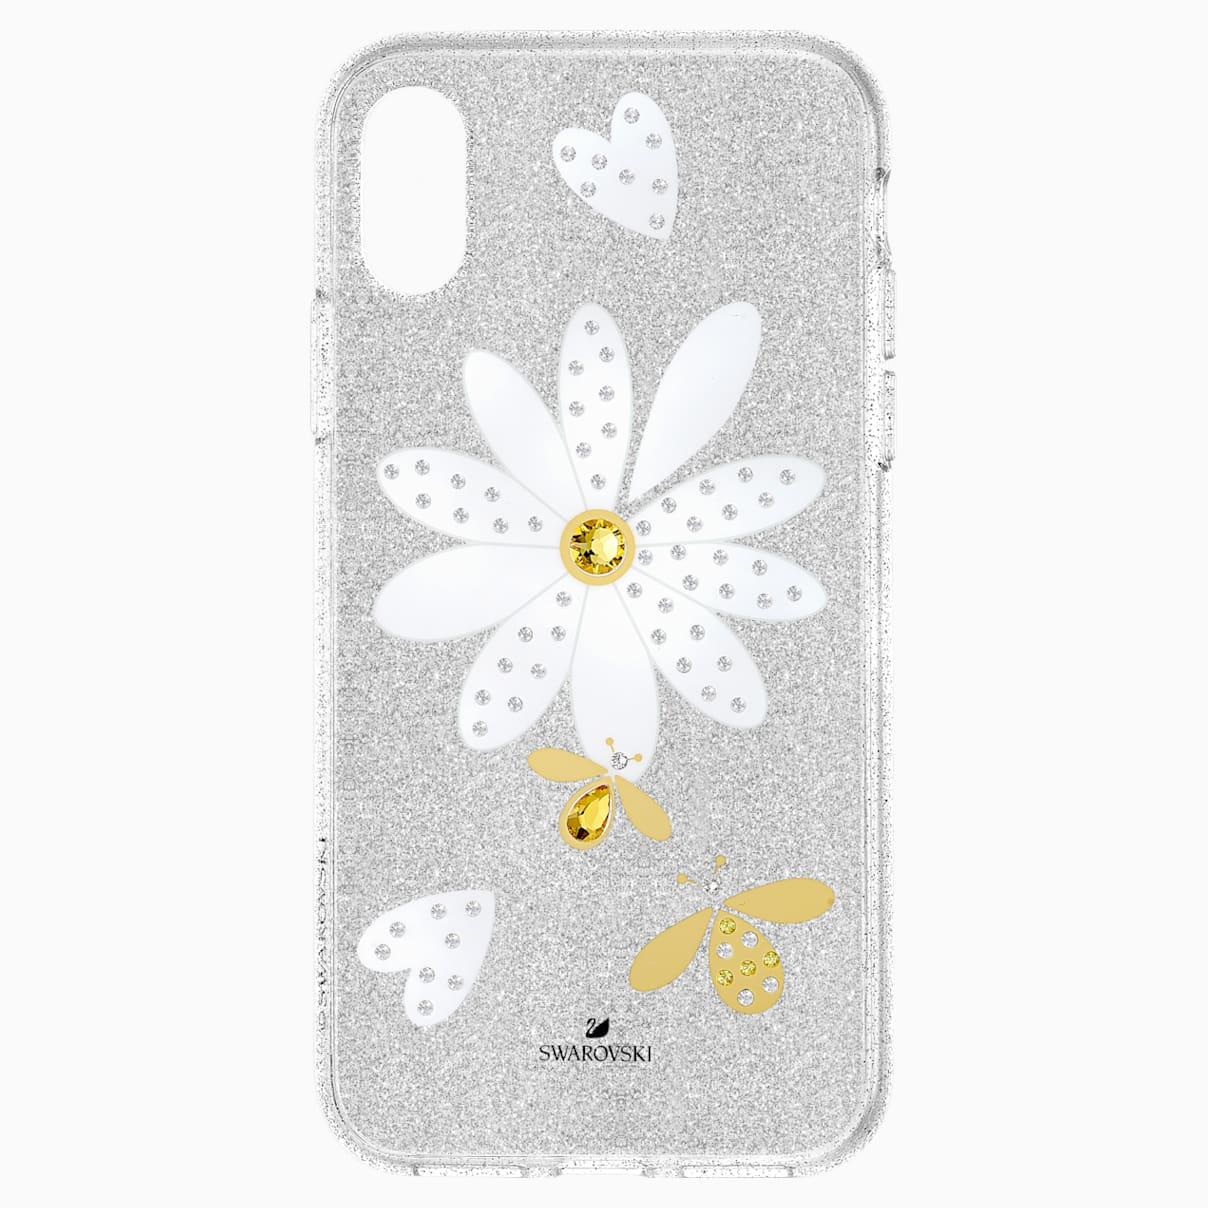 Swarovski Eternal Flower Smartphone Case with Bumper, iPhone® XS Max, Light multi-colored